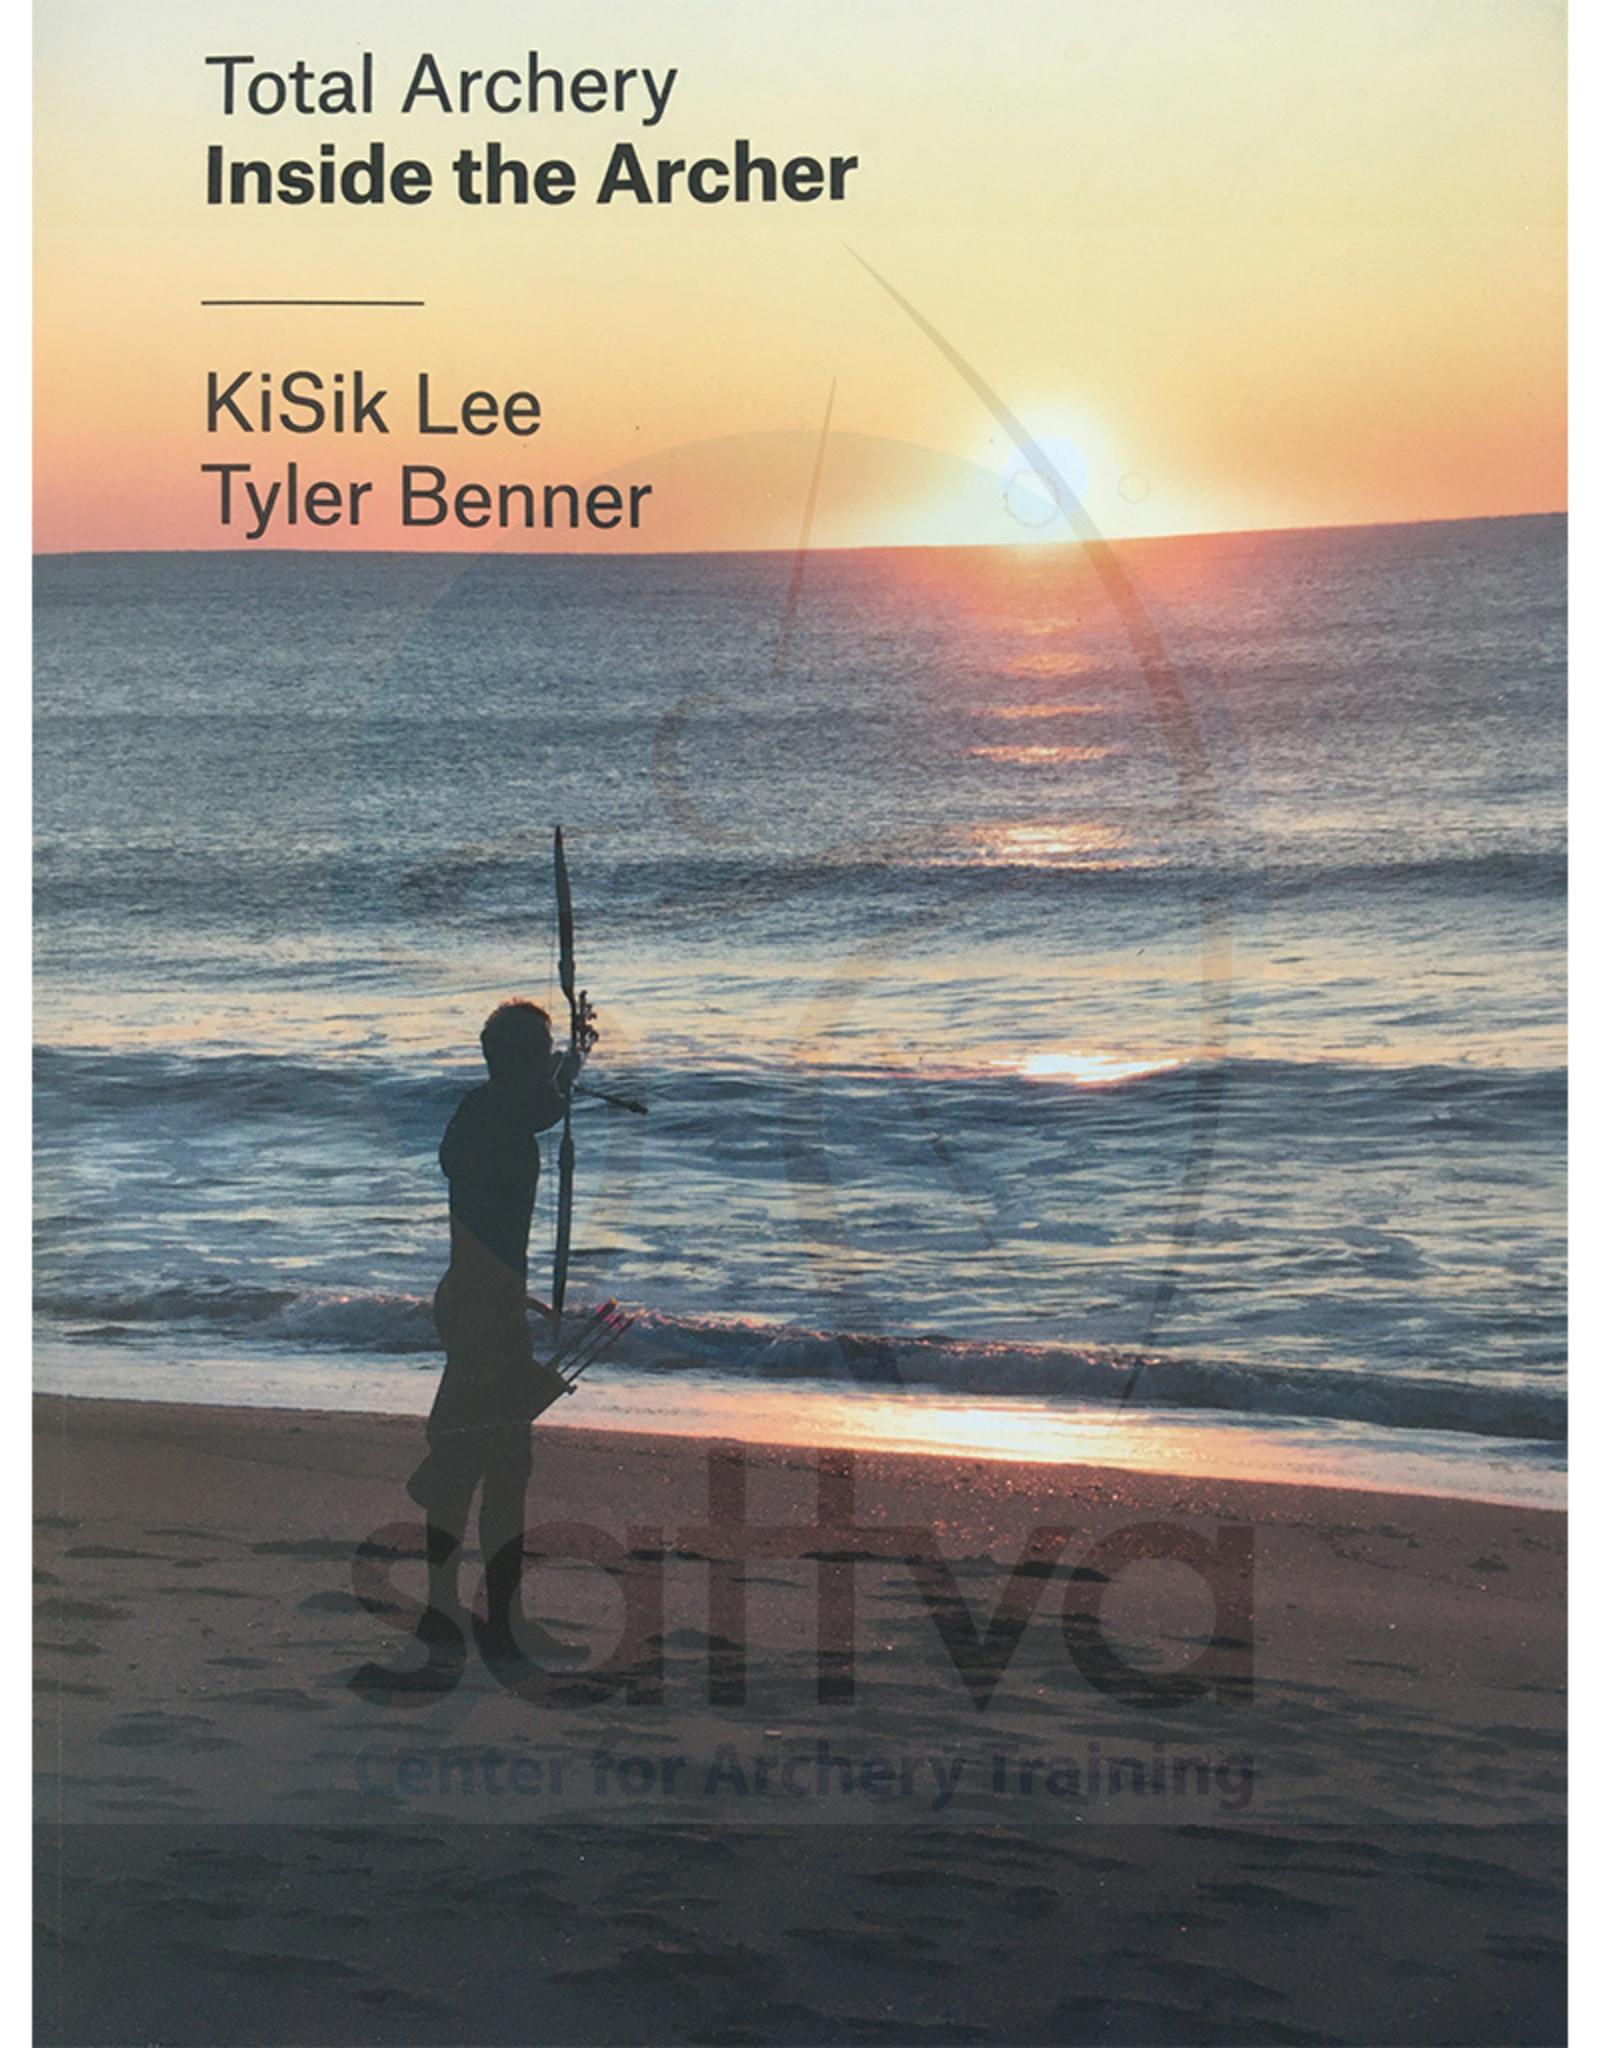 Total Archery: Inside the Archery by Kisik Lee & Tyler Benner, paperback